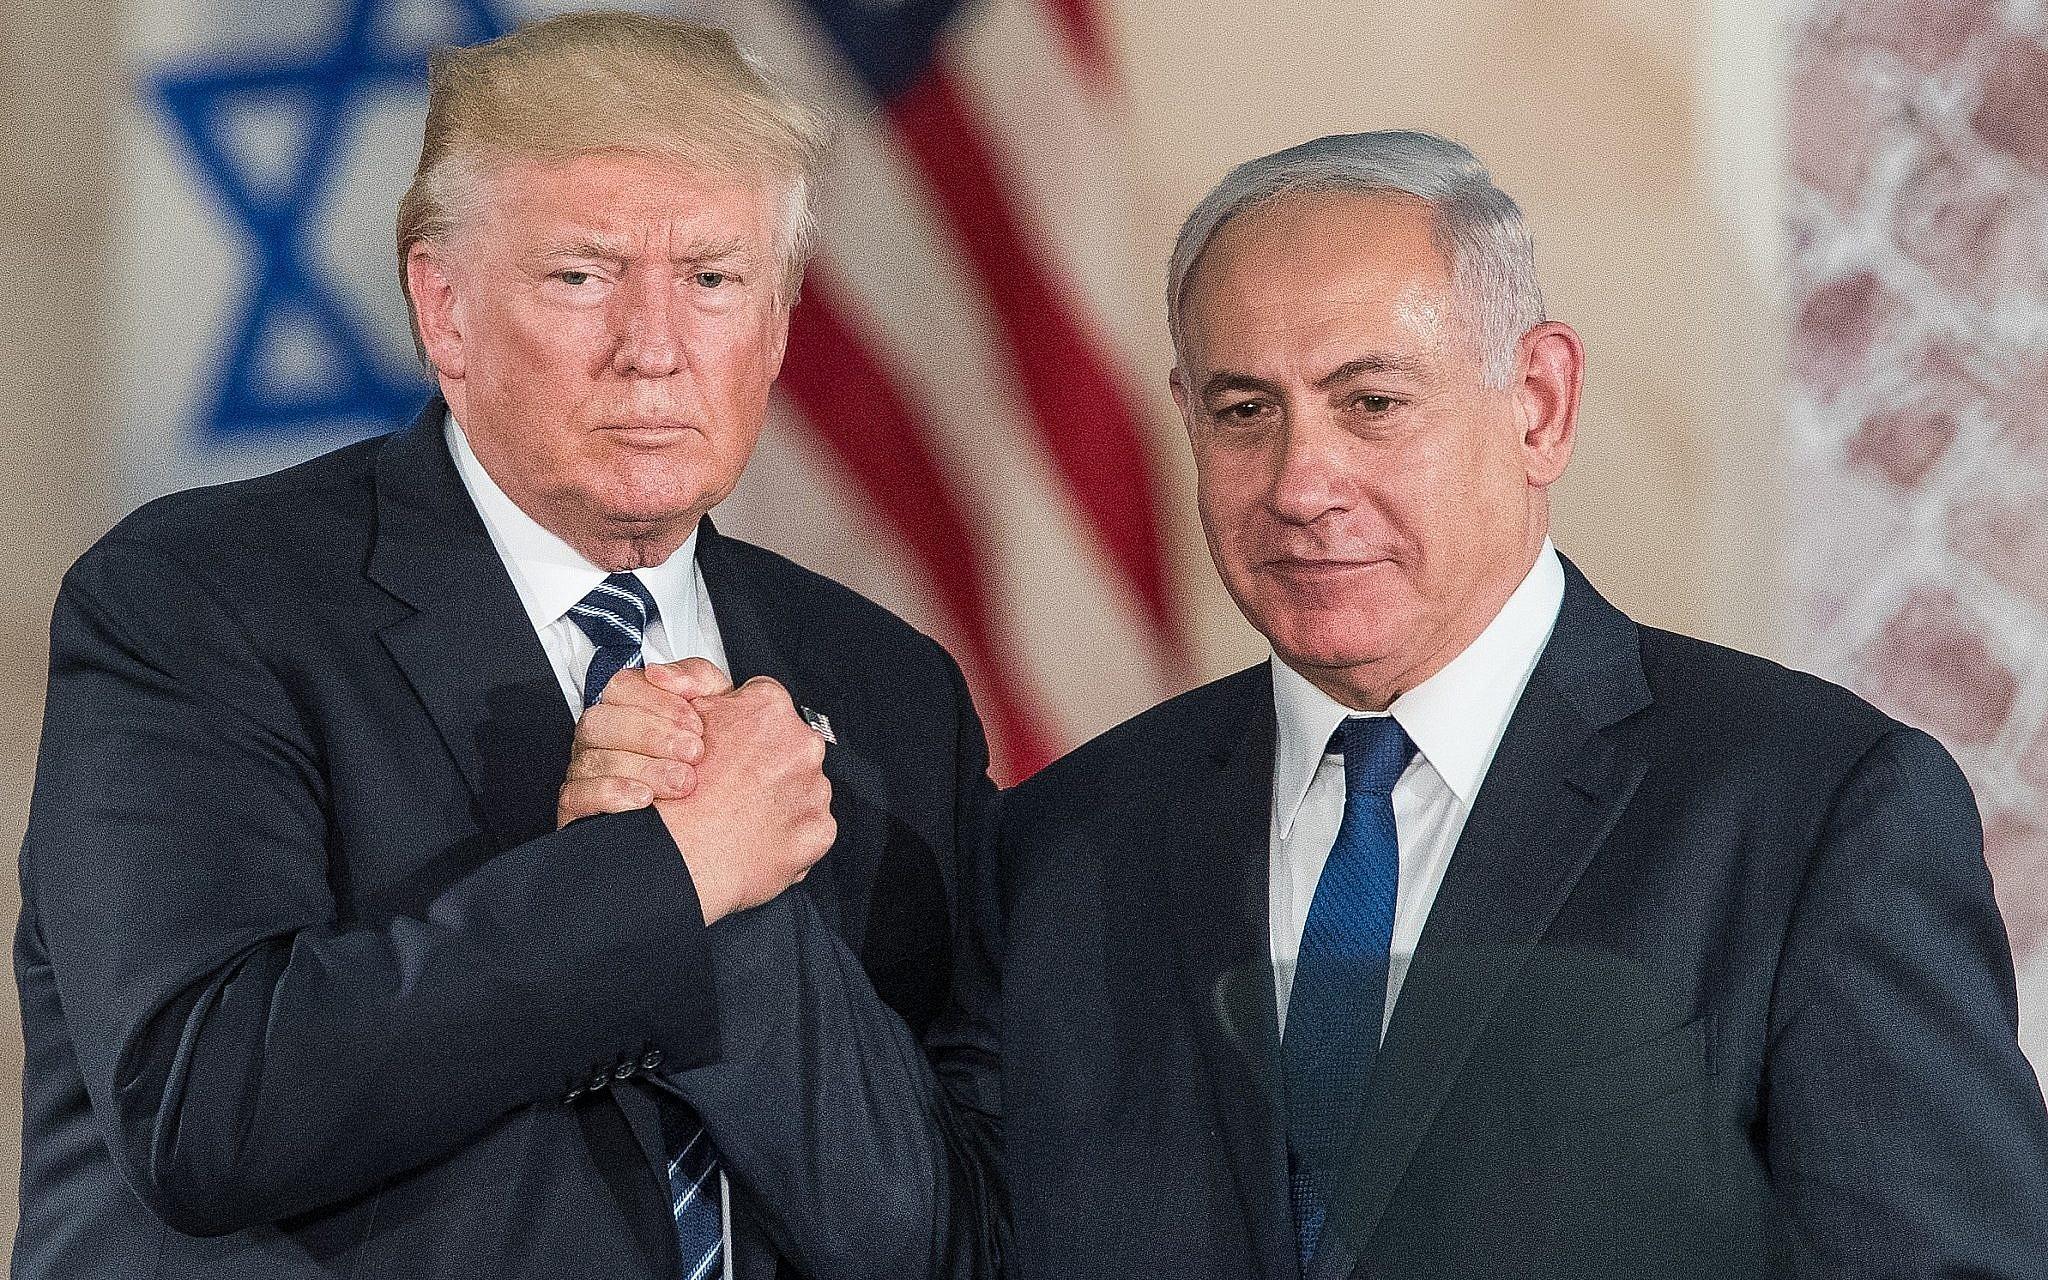 Állítólag Trump nem örült, hogy Netanjahu gratulált Bidennek